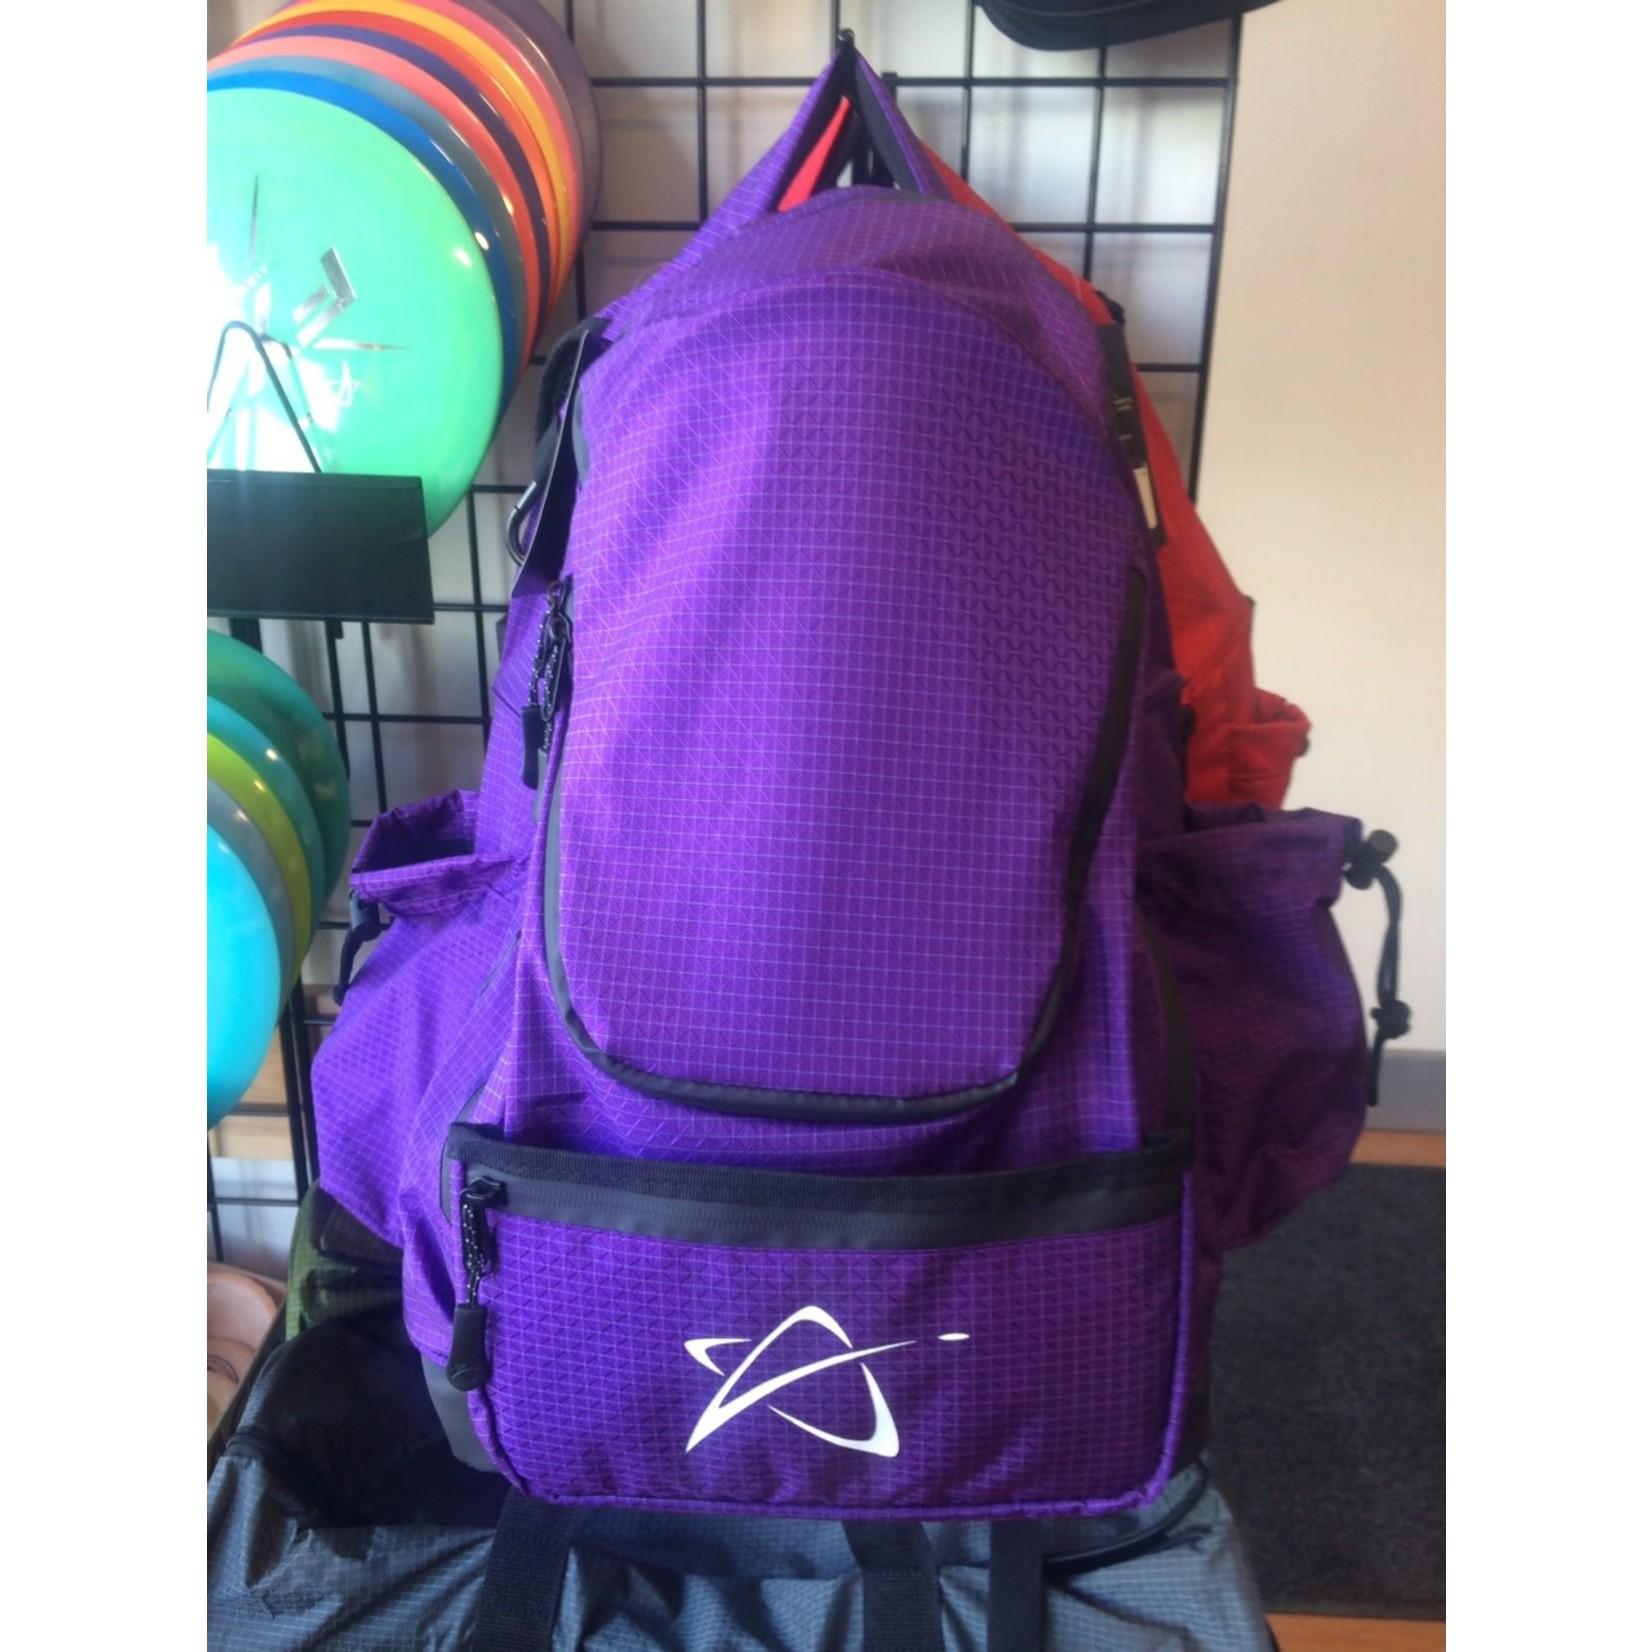 Prodigy Discs Prodigy Backpack - BP-3 V3, Purple